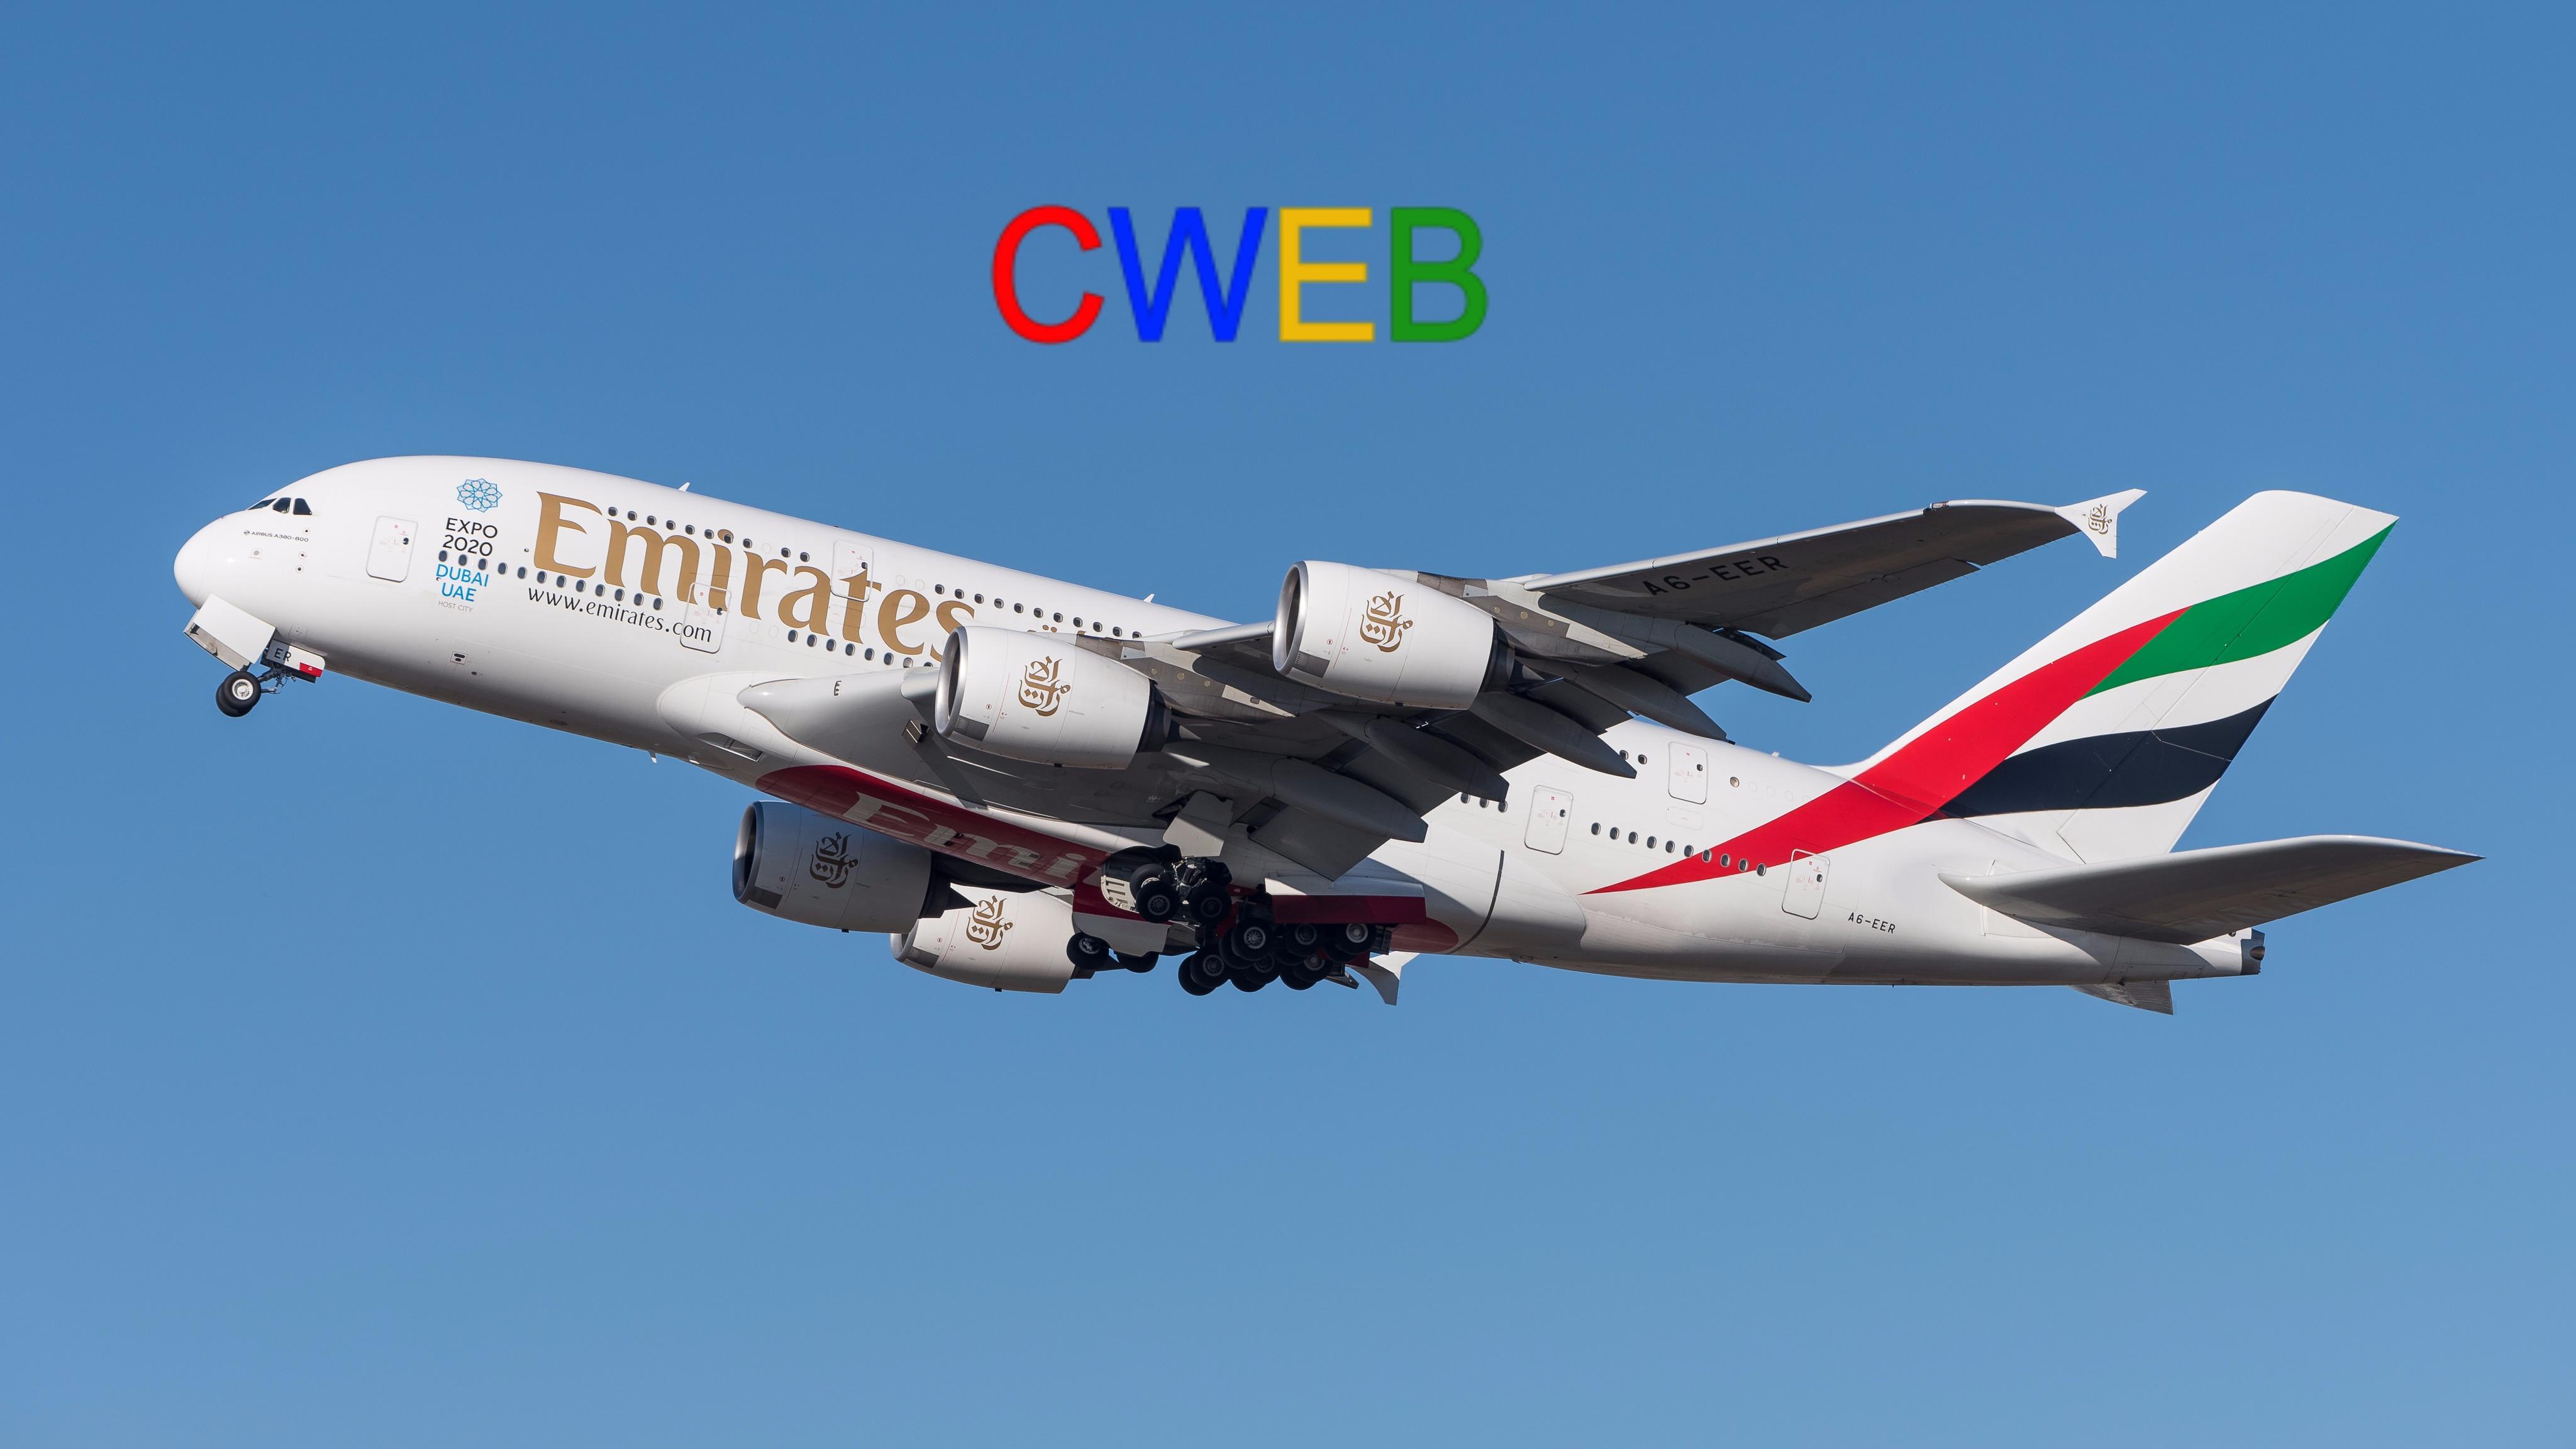 Emirates_Airbus_A380-861_A6-EER_MUC_2015_04 (1).jpg